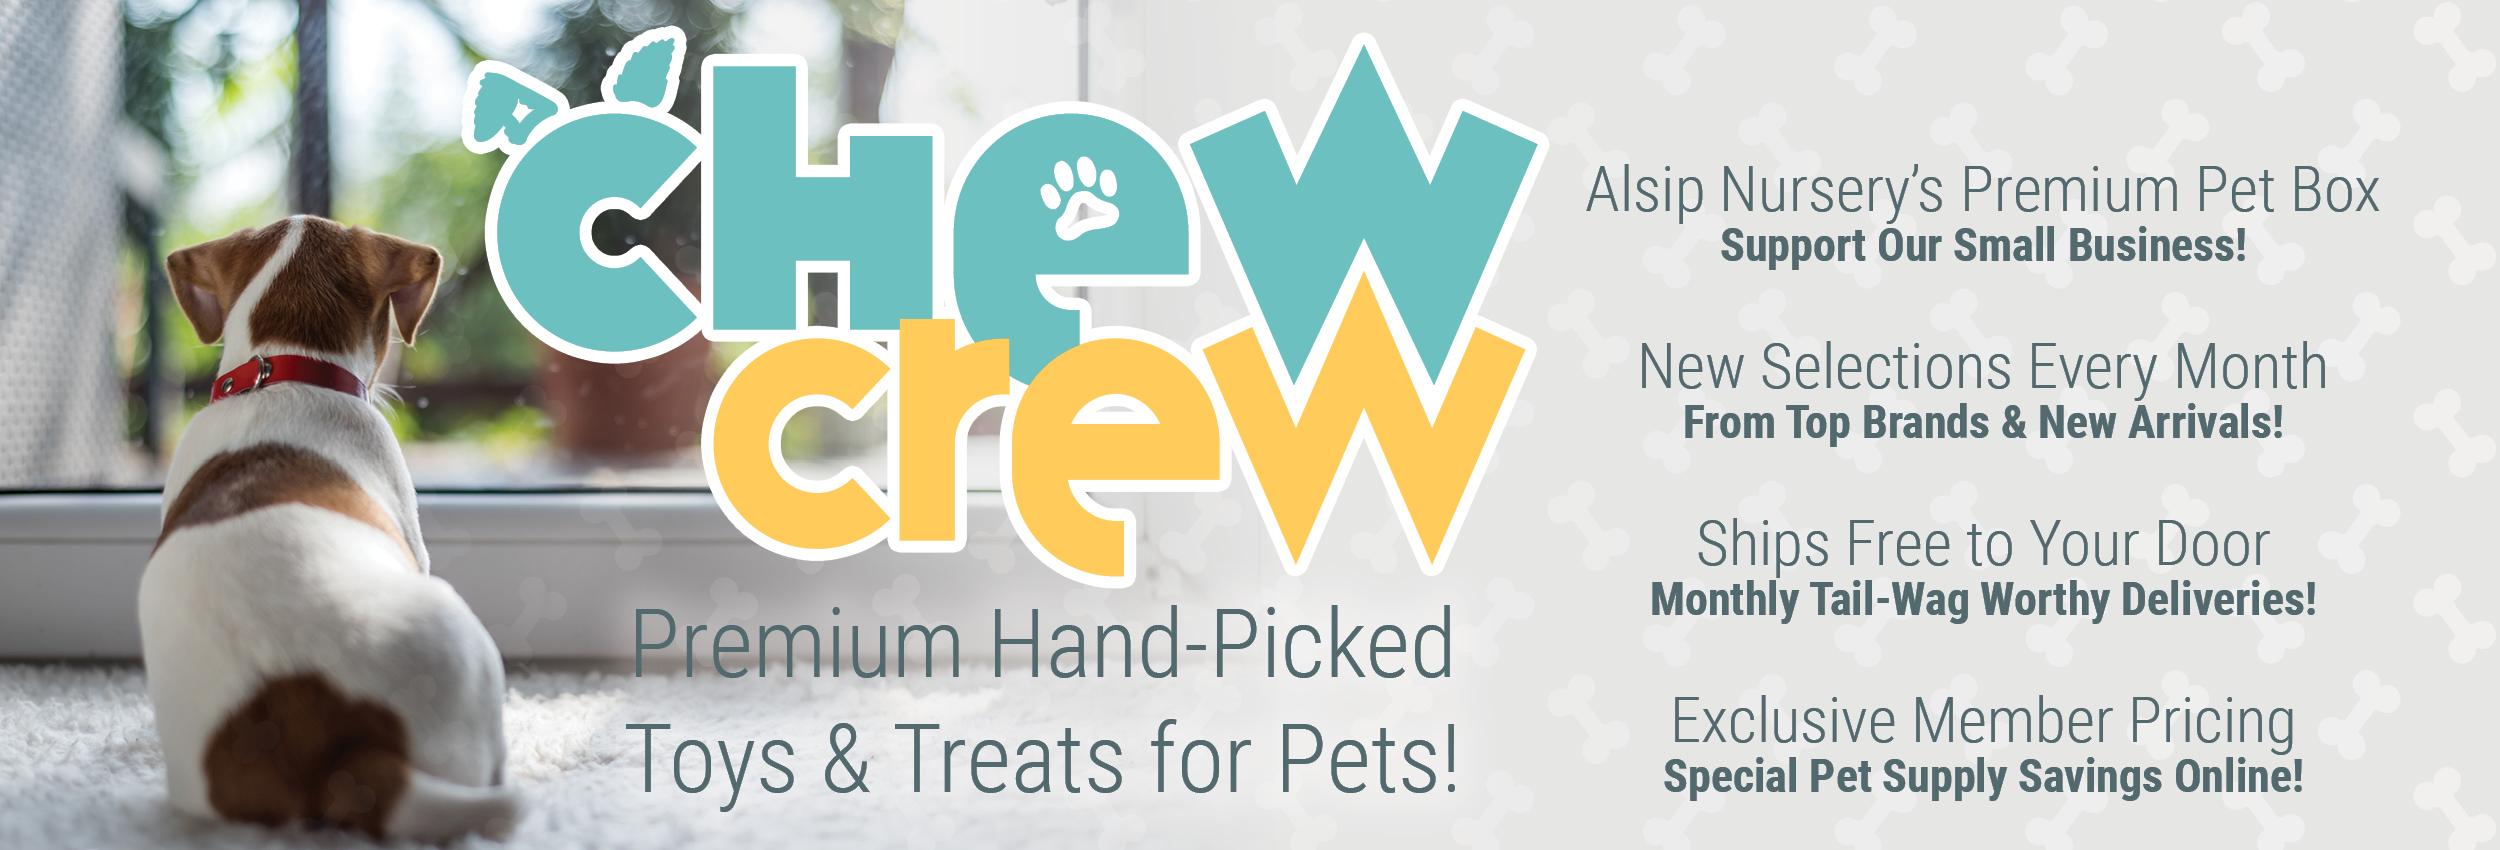 Chew Crew Premium Hand-Picked Toys & Treats for Pets